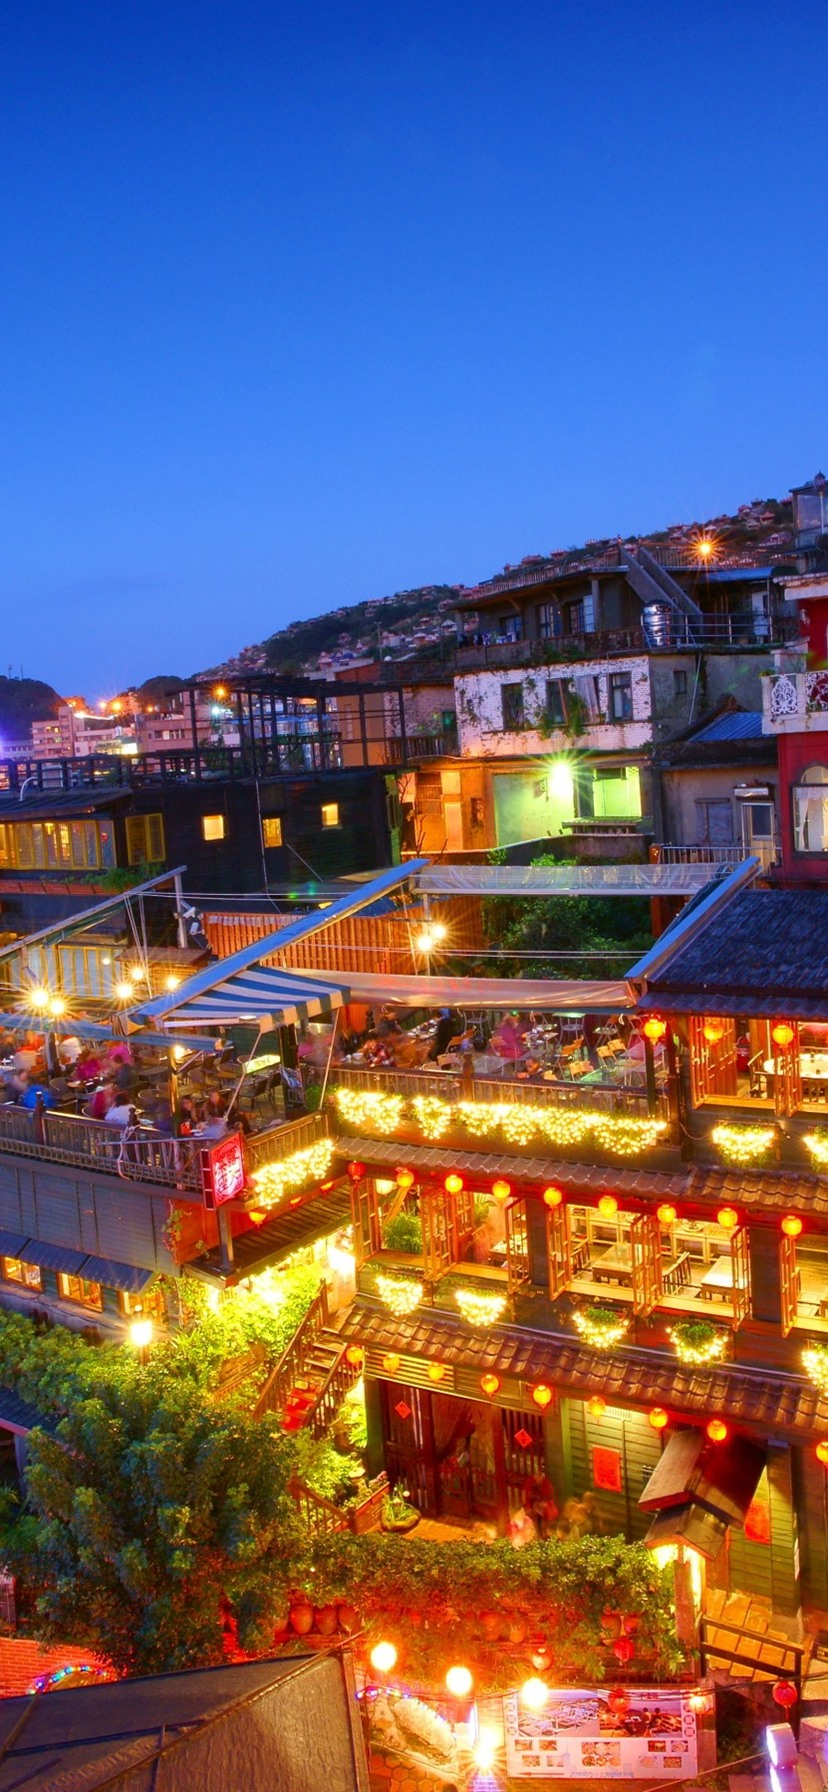 Jiufen Taipei Night City Lights Taiwan 828x1792 Iphone